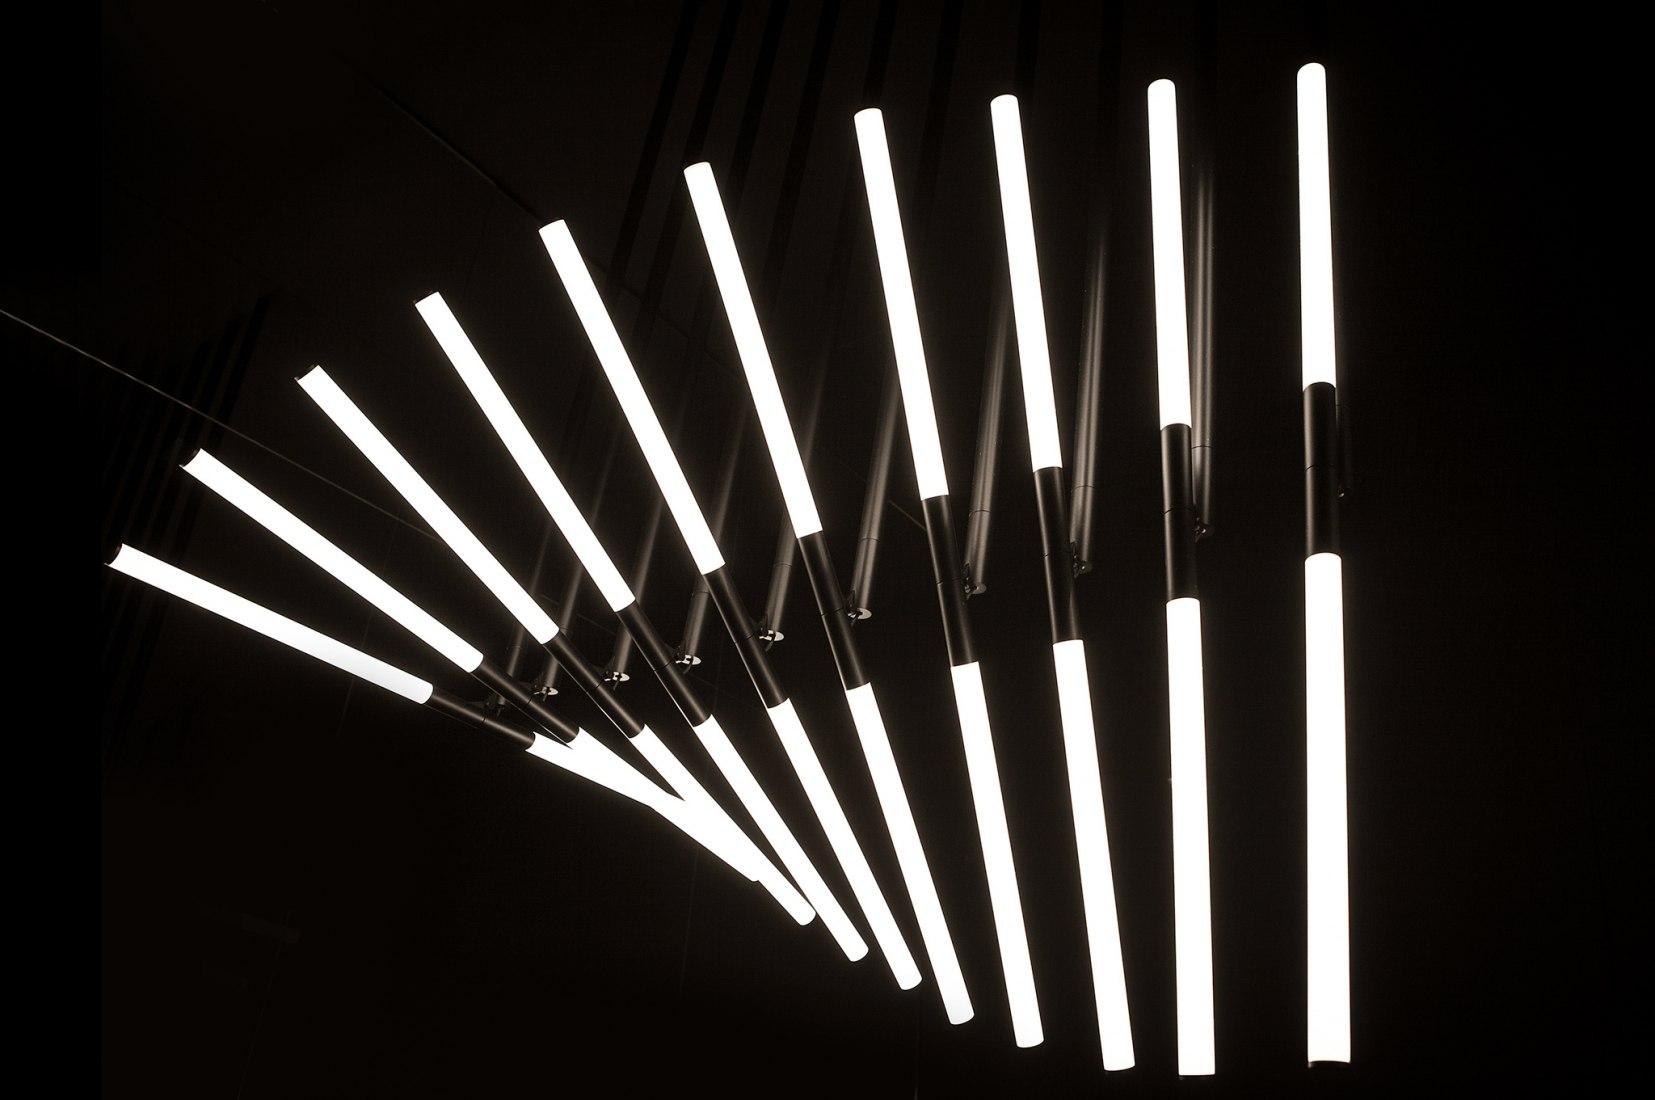 XY 180 Delta Light by OMA. Photograph @ Luca Cioci, courtesy of Delta Light